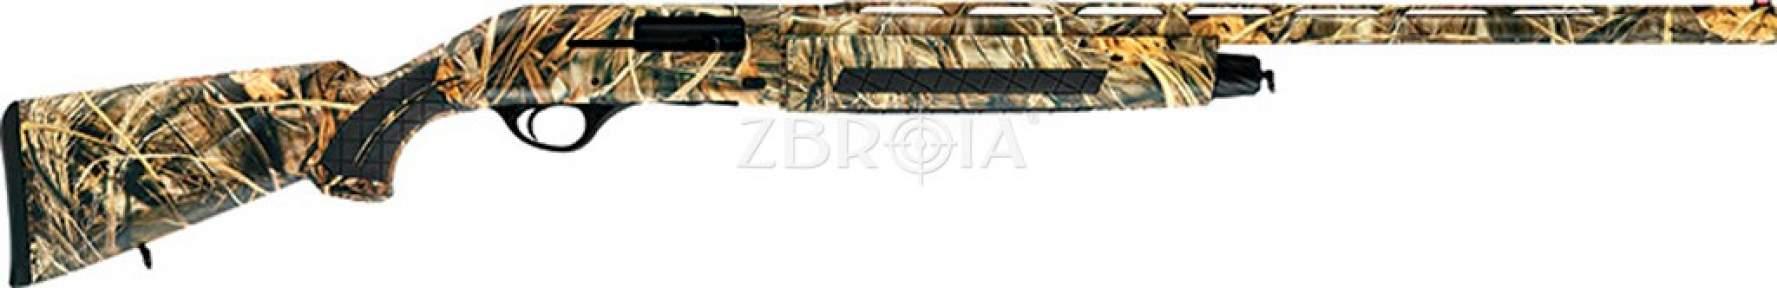 Ружье Hatsan Escort Xtreme Realtree Max4 HD SVP кал. 12/76